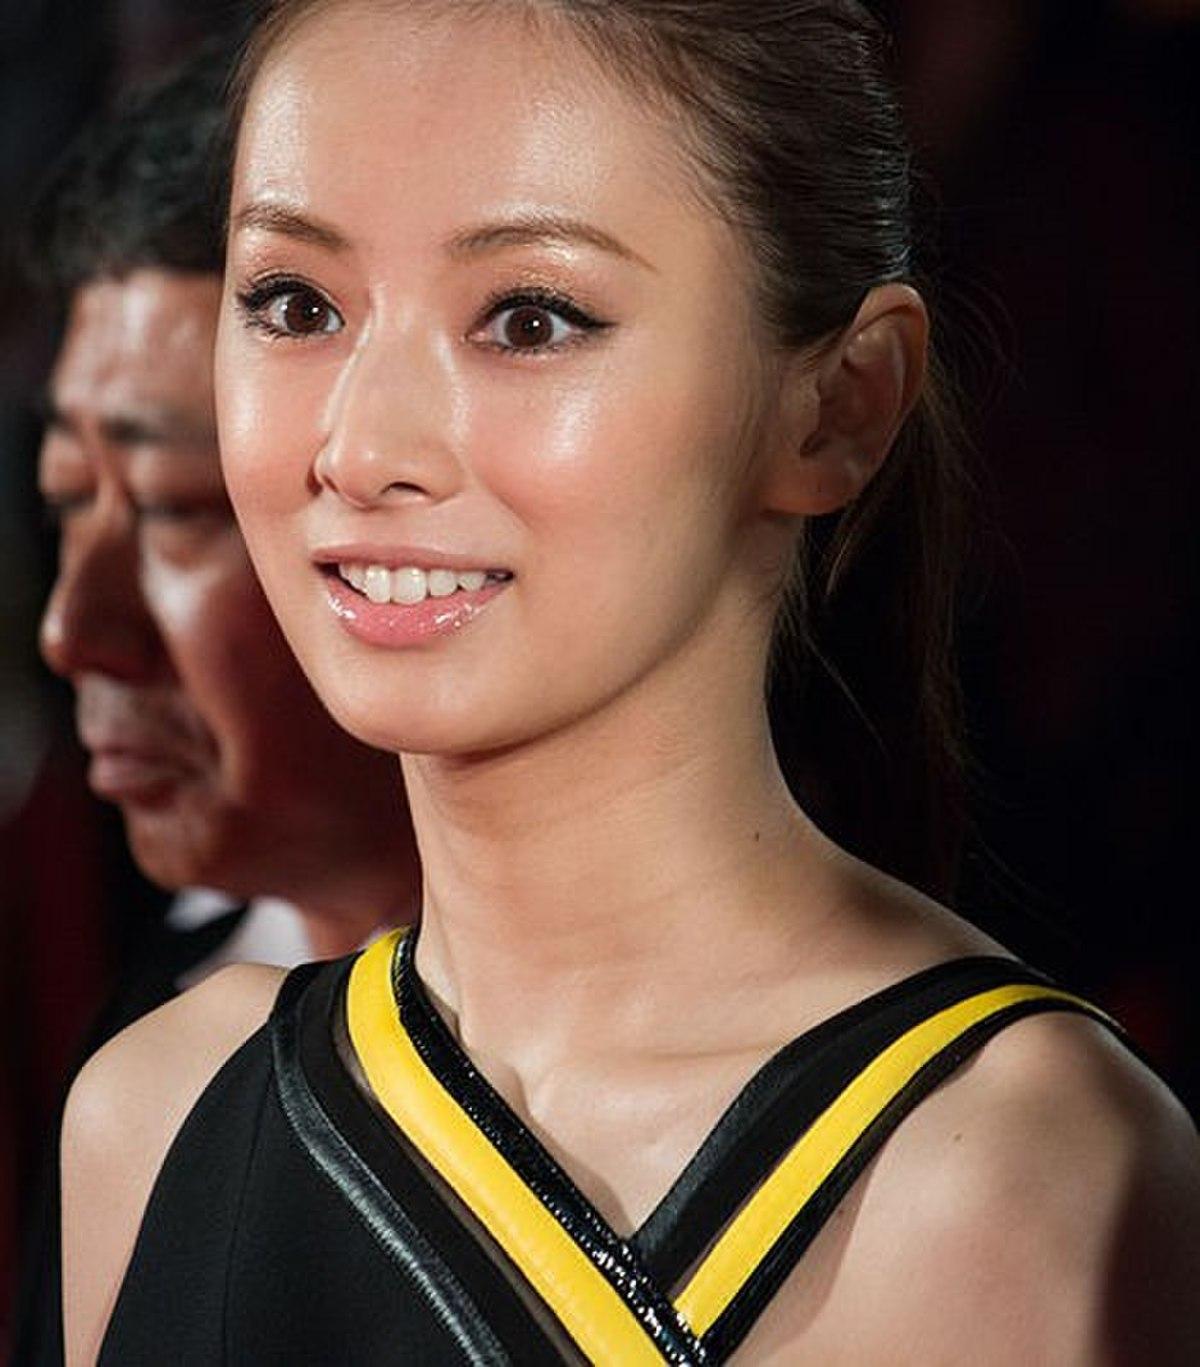 北川景子 - Wikipedia